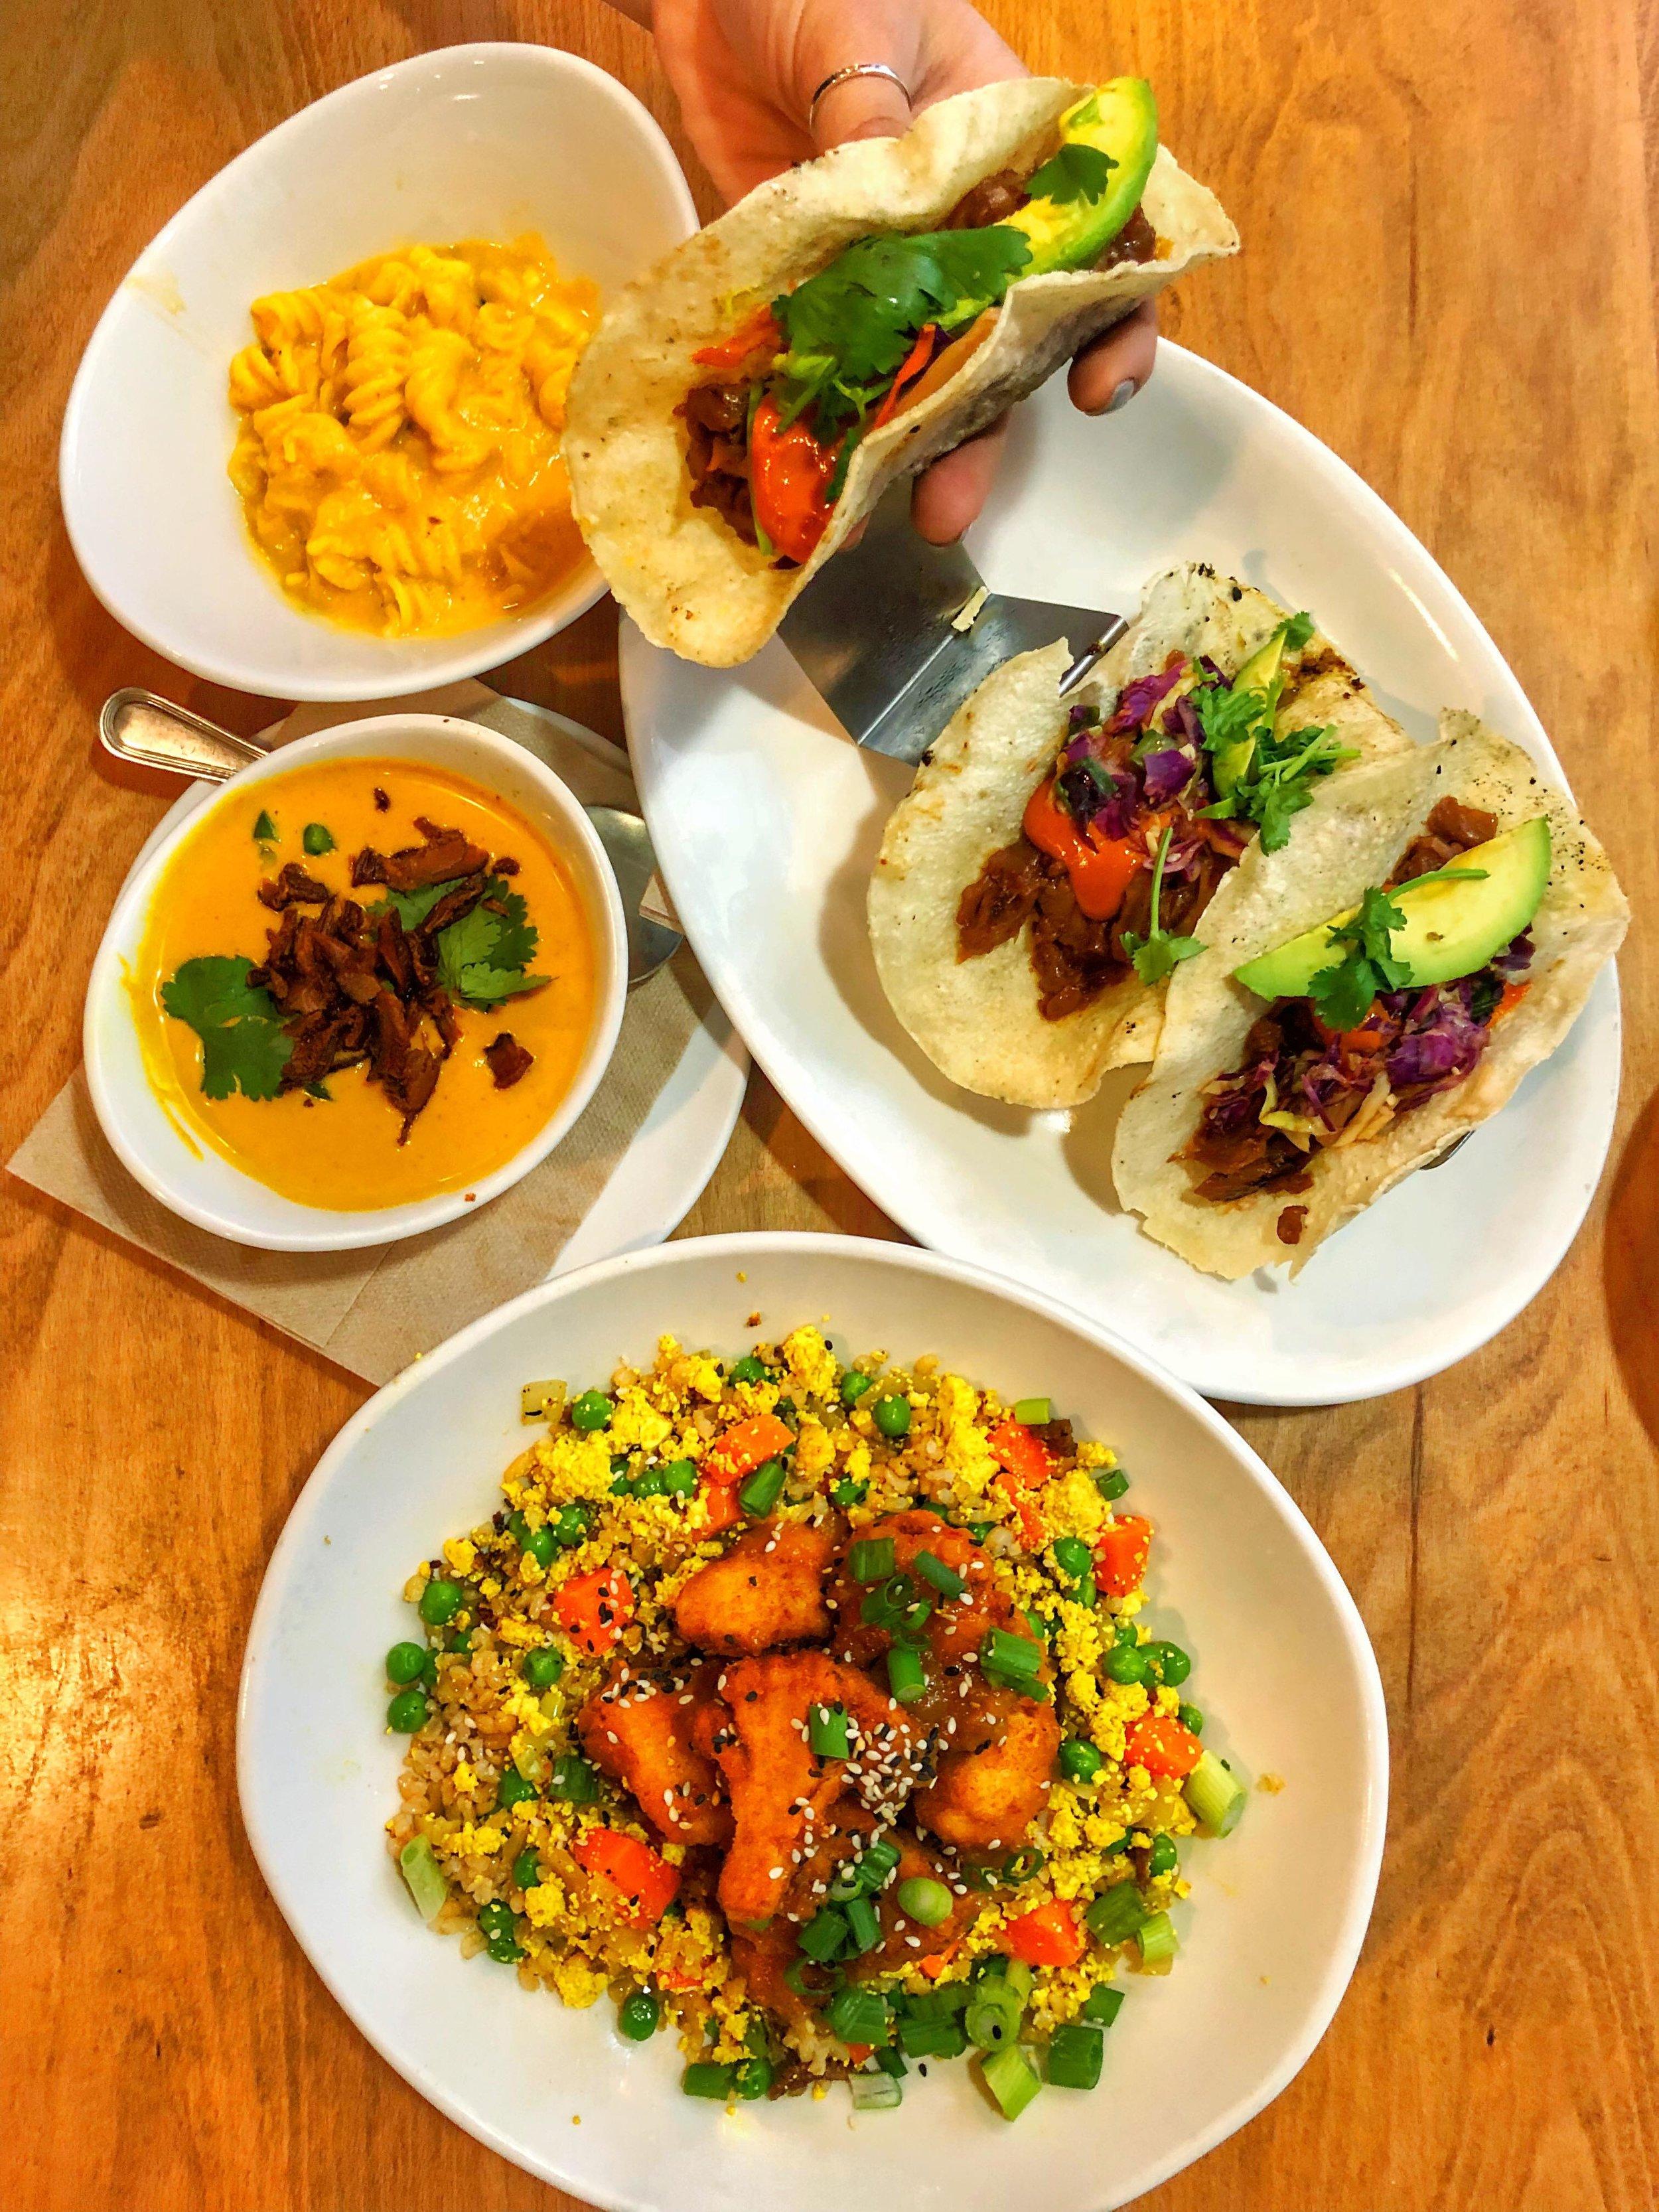 Orange chicken cauliflower, Thai Red Curry Soup, Jackfruit Taco, Mac and Cheese